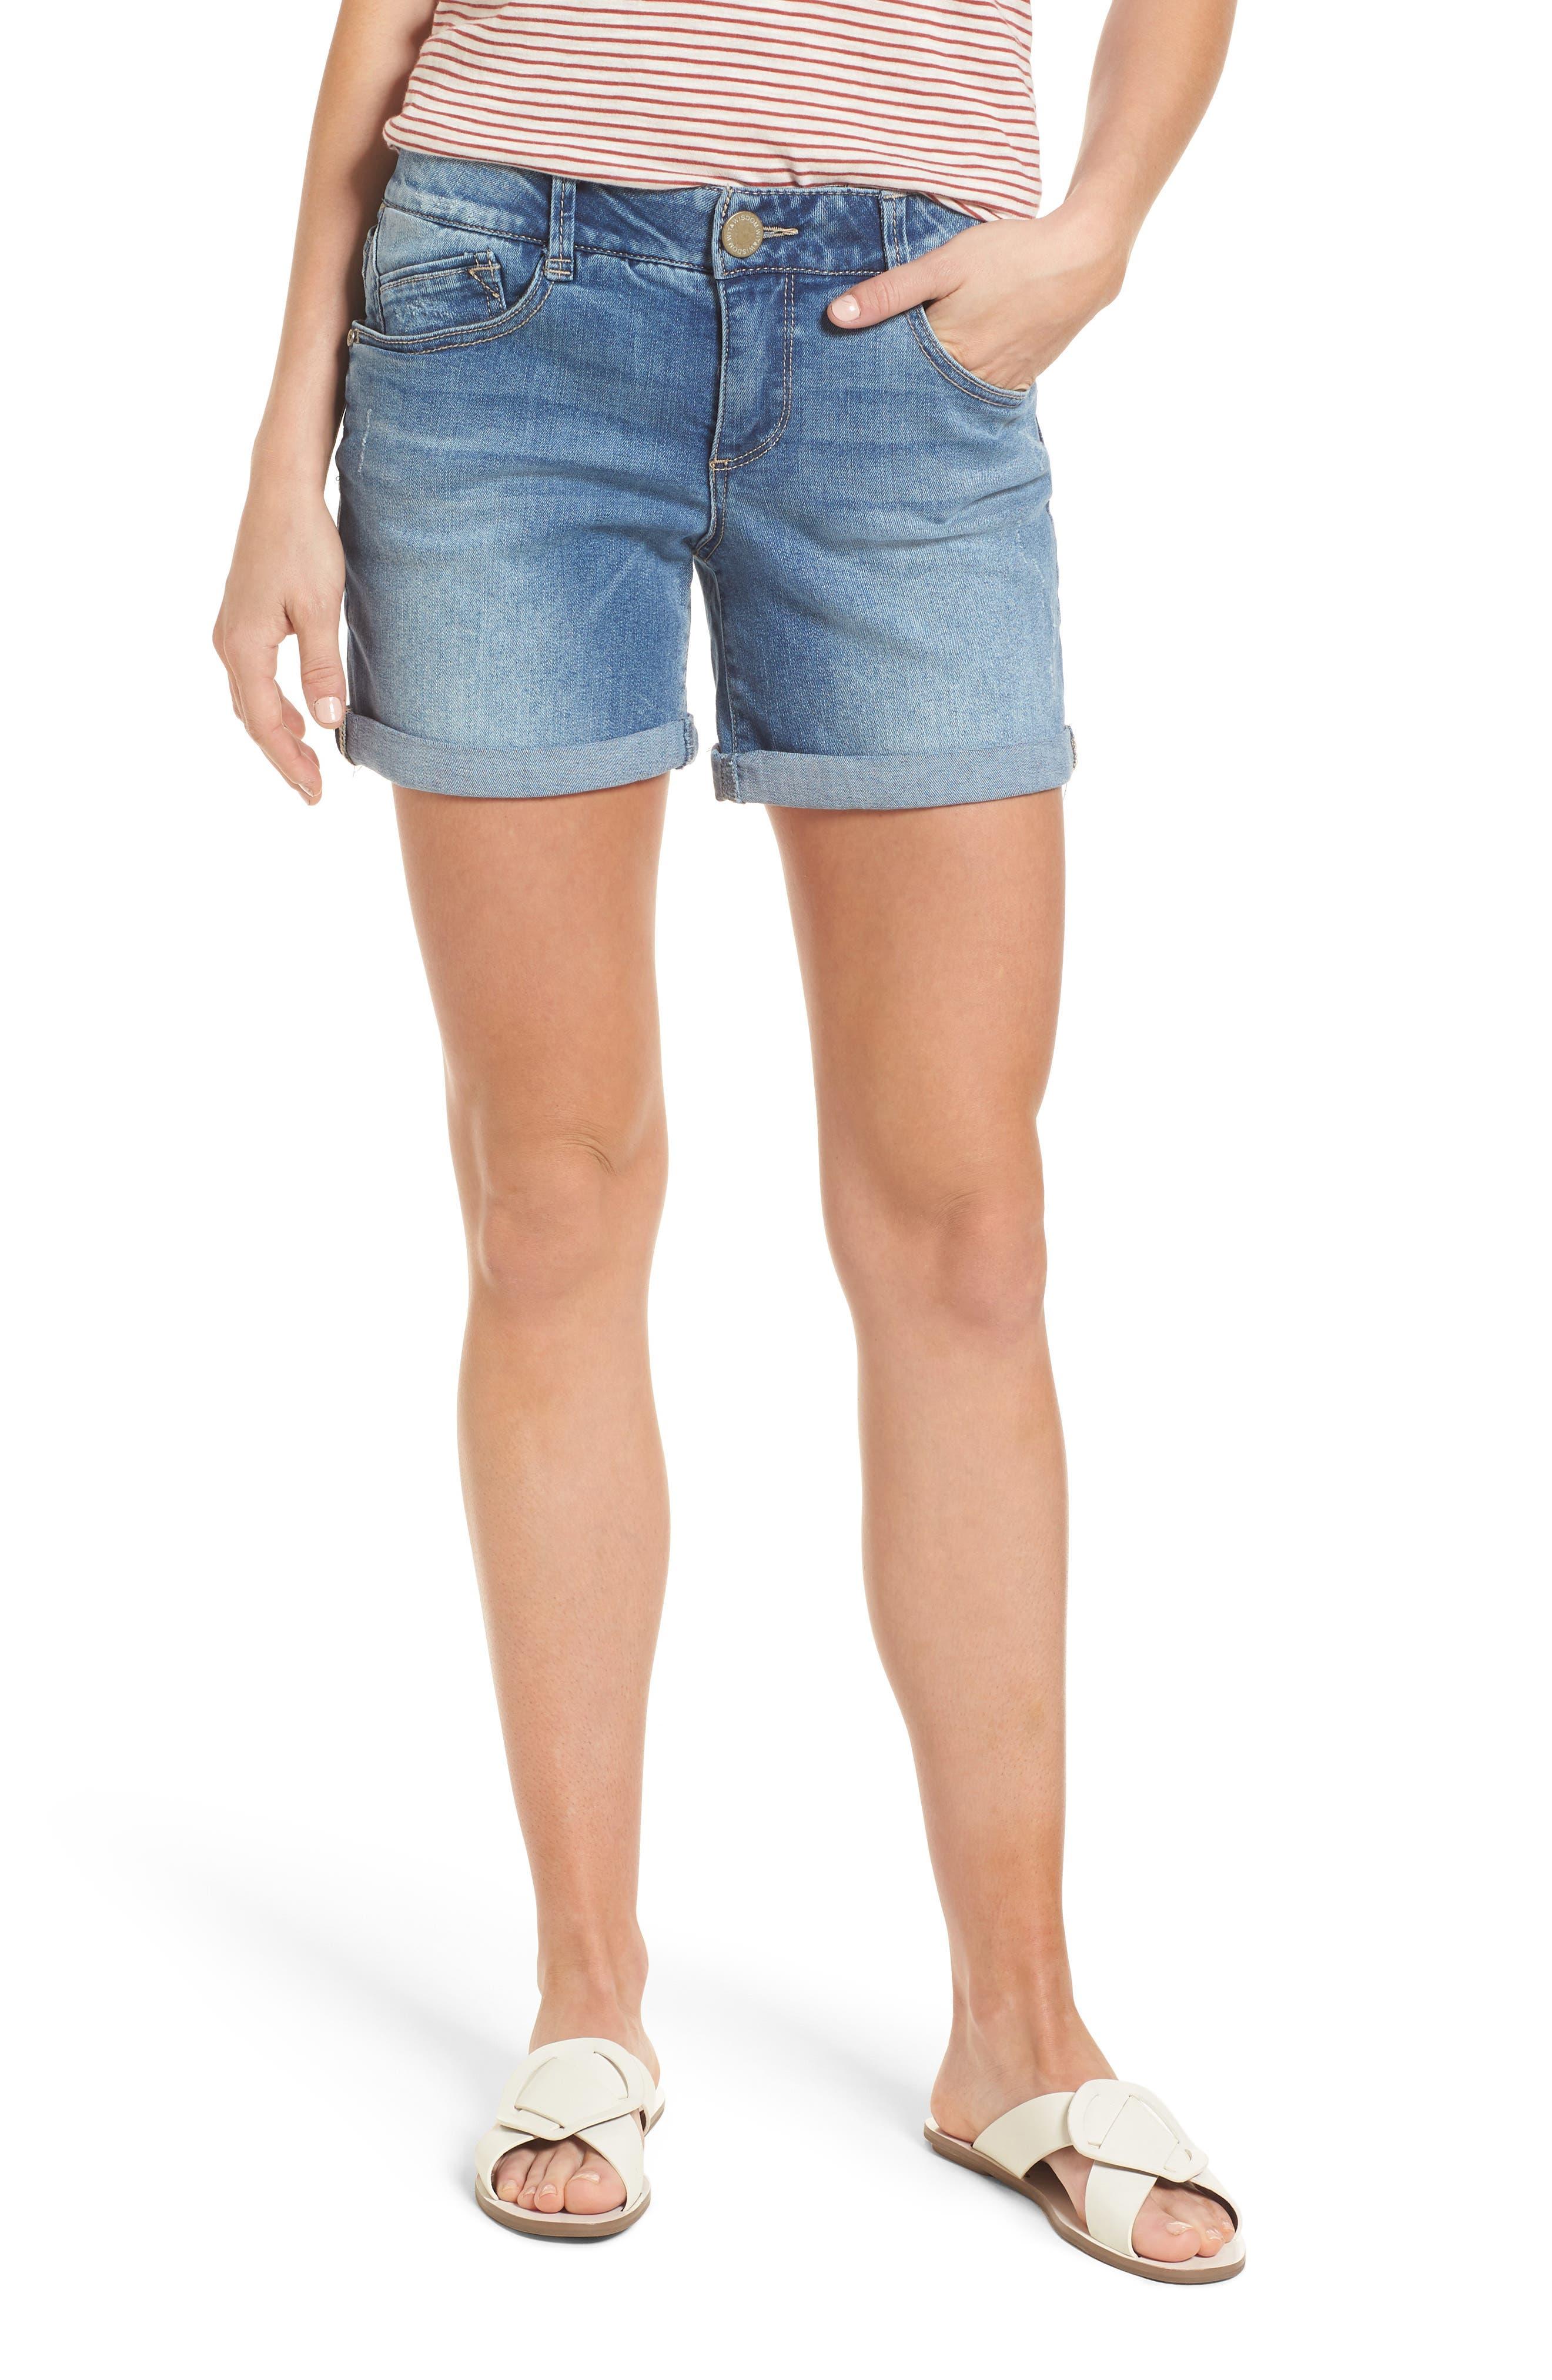 Ab-solution Denim Shorts,                         Main,                         color, 458